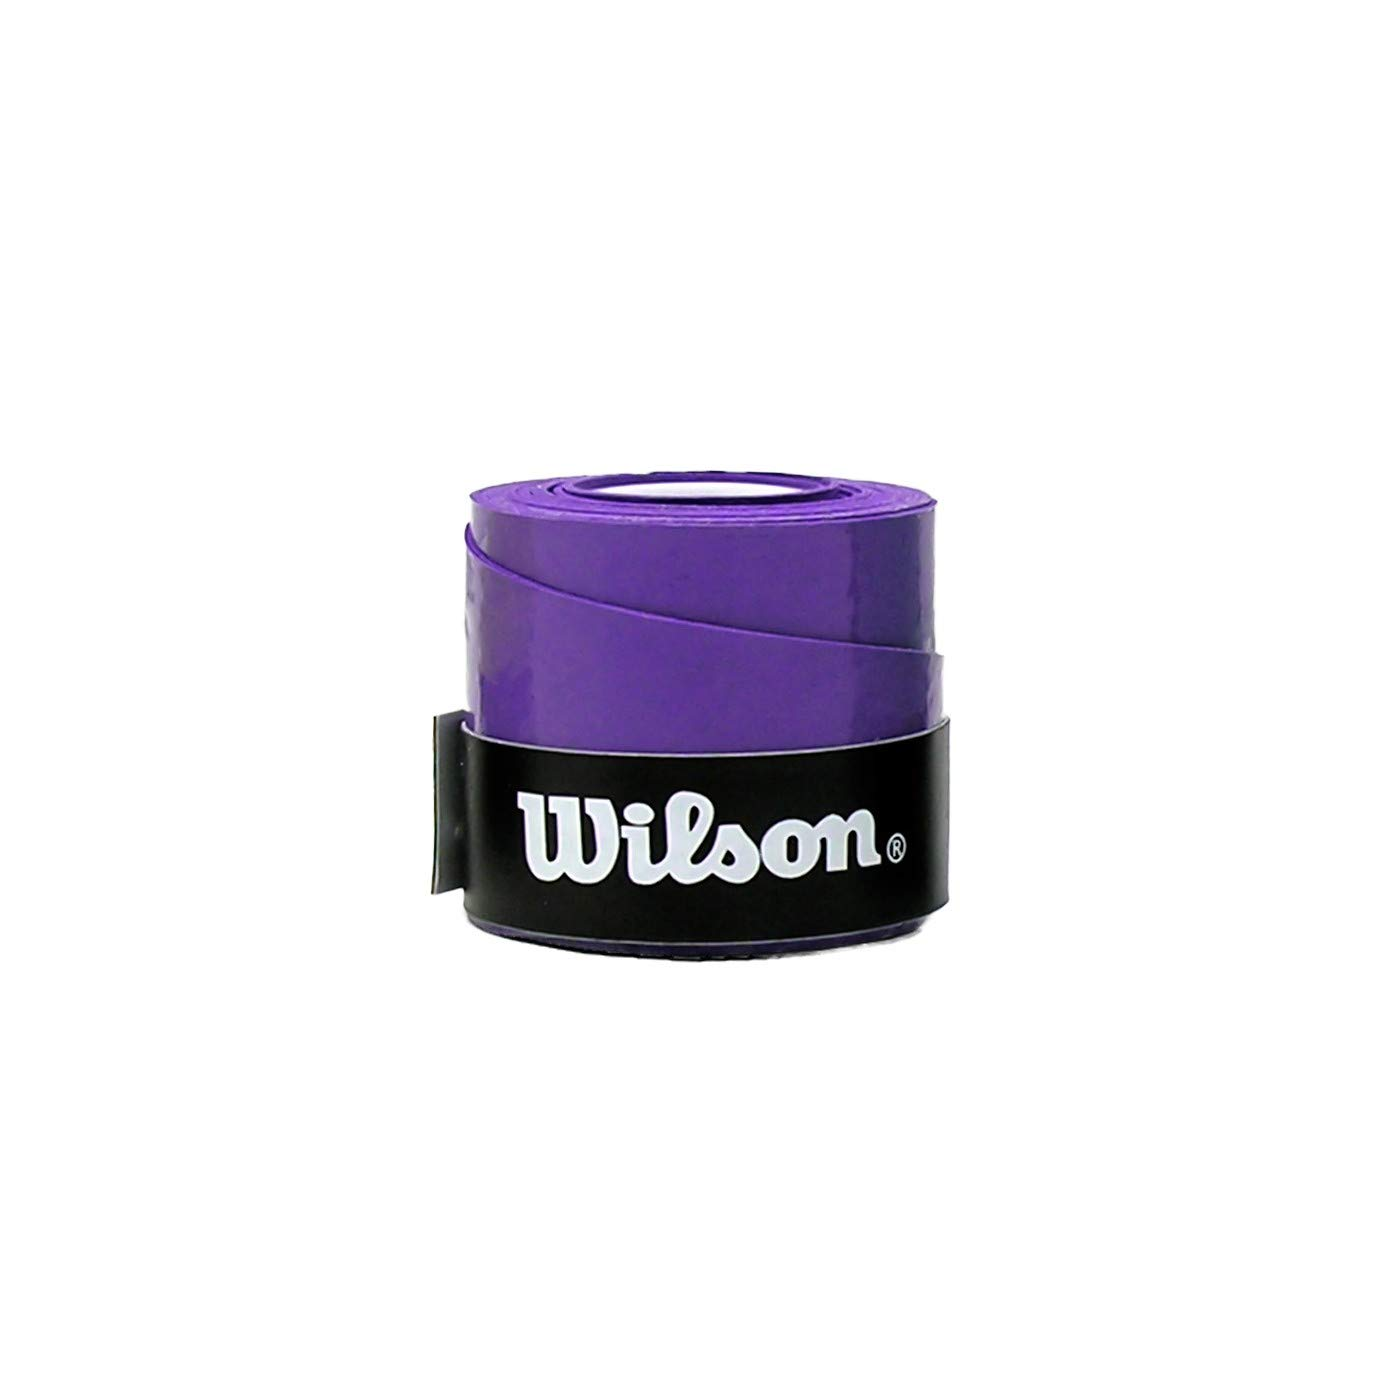 ZRZ Pack Grip Padel HESACORE Tour Grip + 1und overgrip Wilson ...